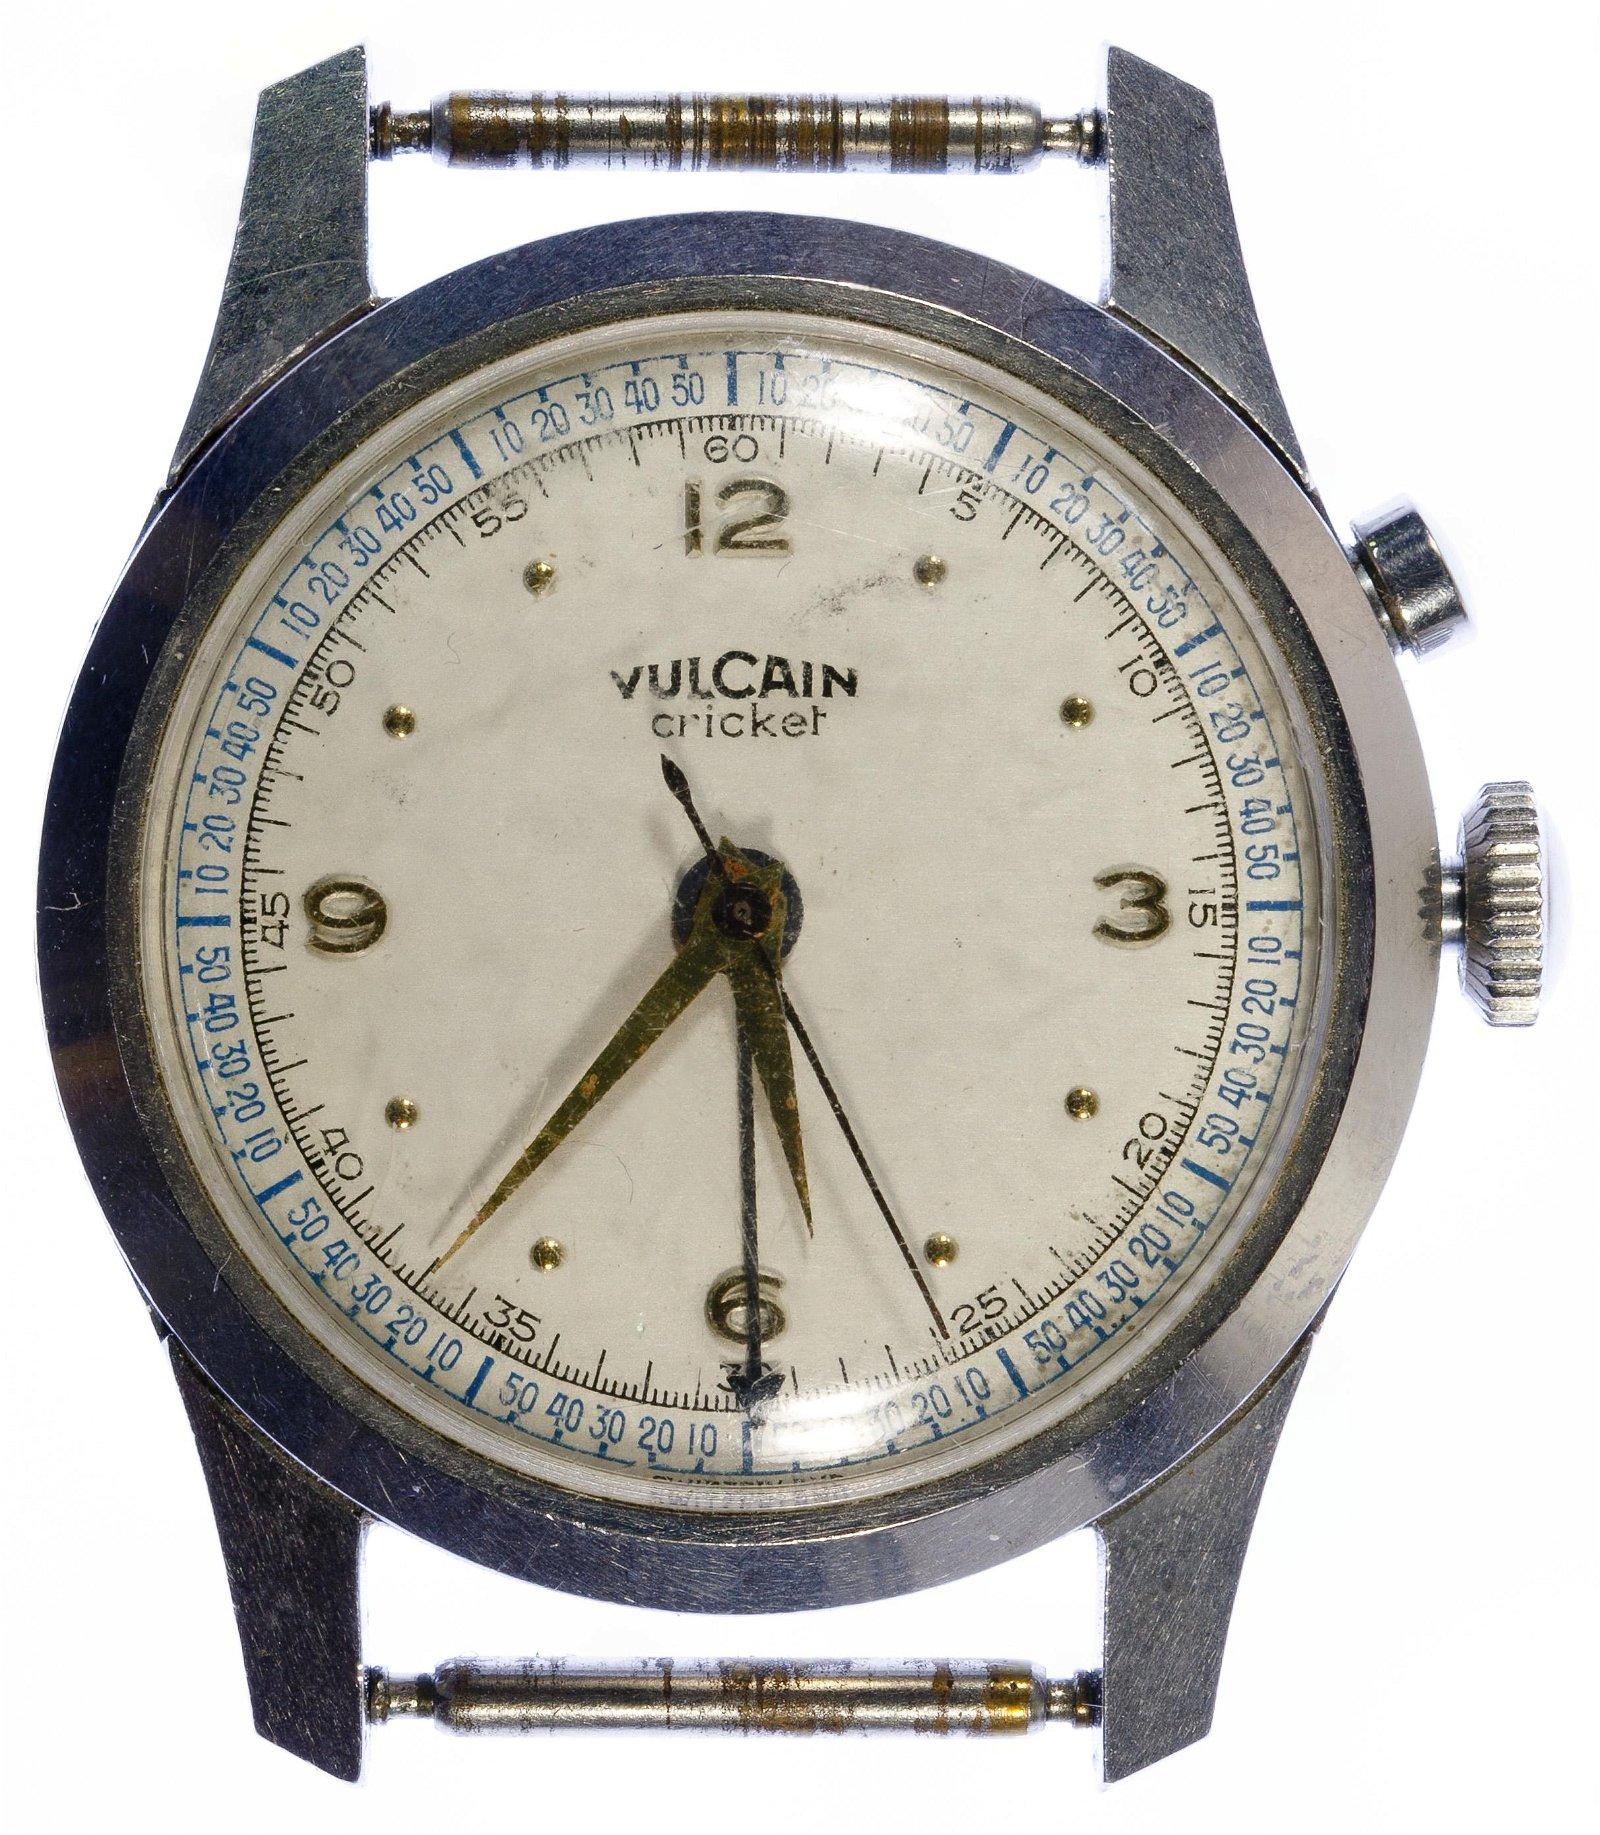 Vulcain 'Cricket' Alarm Wrist Watch